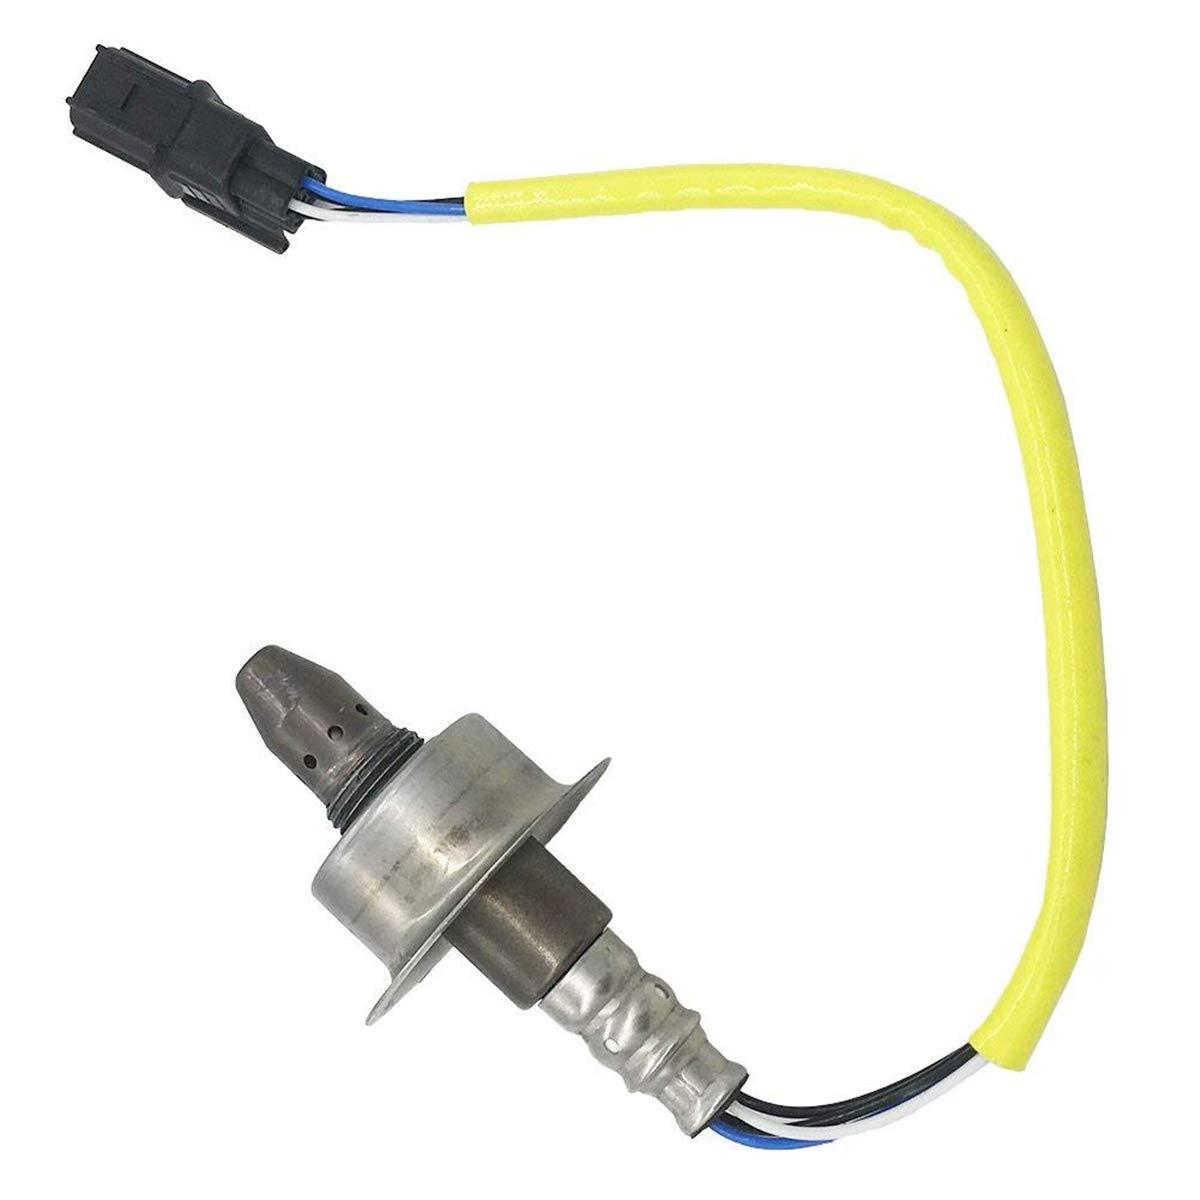 Triumilynn 234-9118 Air Fuel Ratio Oxygen Sensor Upstream Fits for 2012-2014 Honda CR-V Civic Crosstour Acura ILX 2.4L-L4 Replace# 36531-RX0-A01 HUABO AUTO Parts